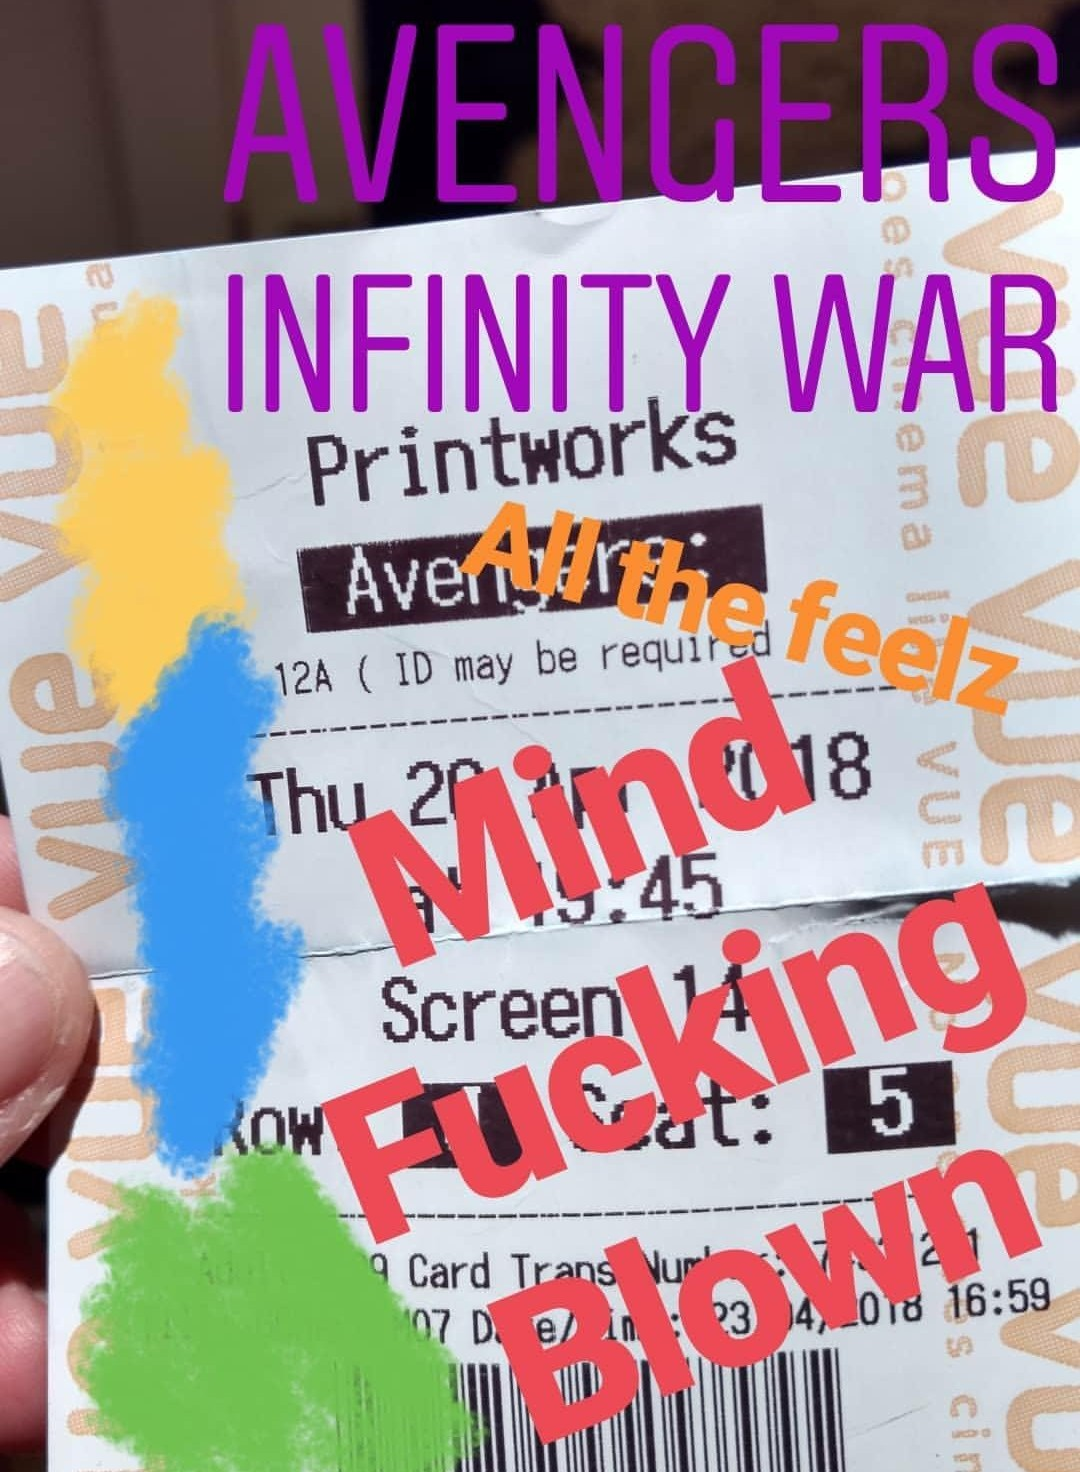 Infinity war IG story.jpg